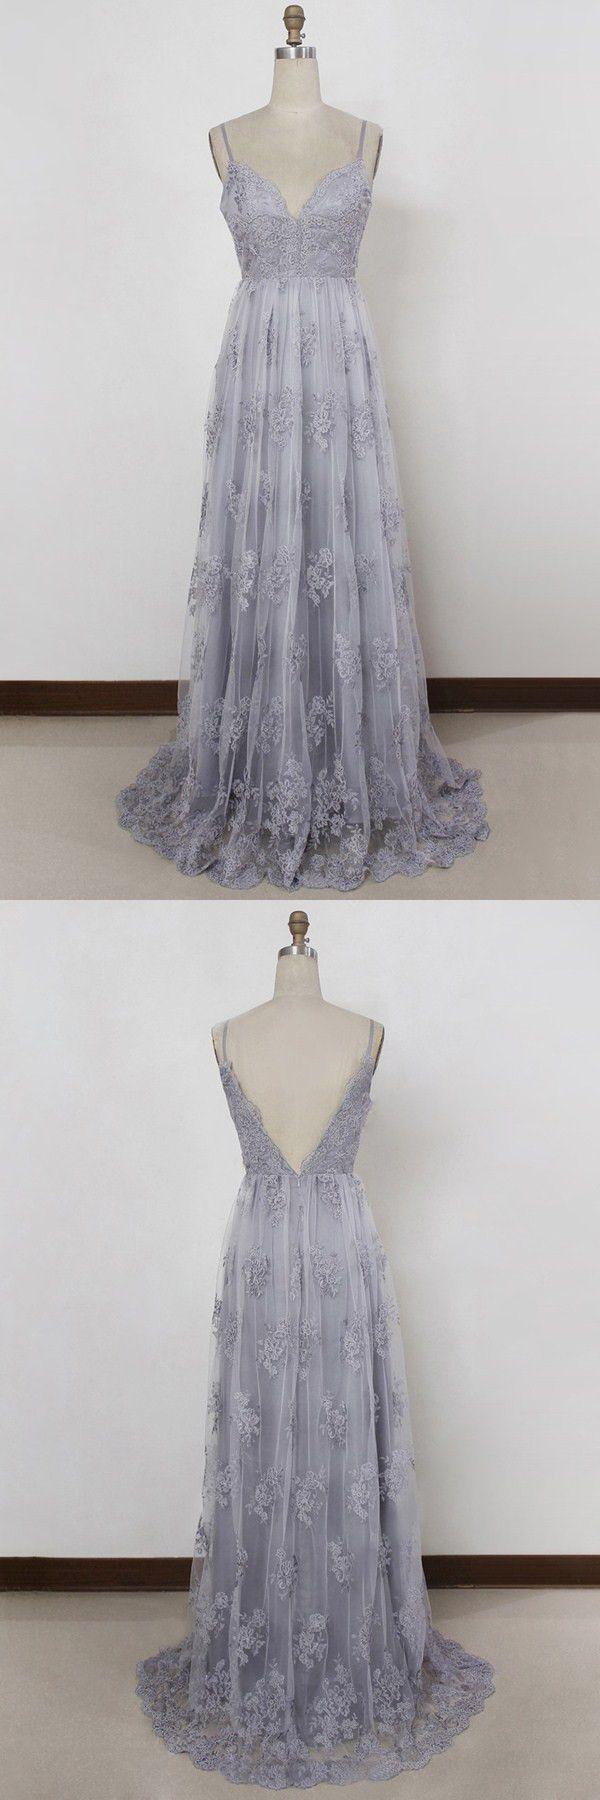 Prom dresses lavender party dresses lace long prom dresses cheap